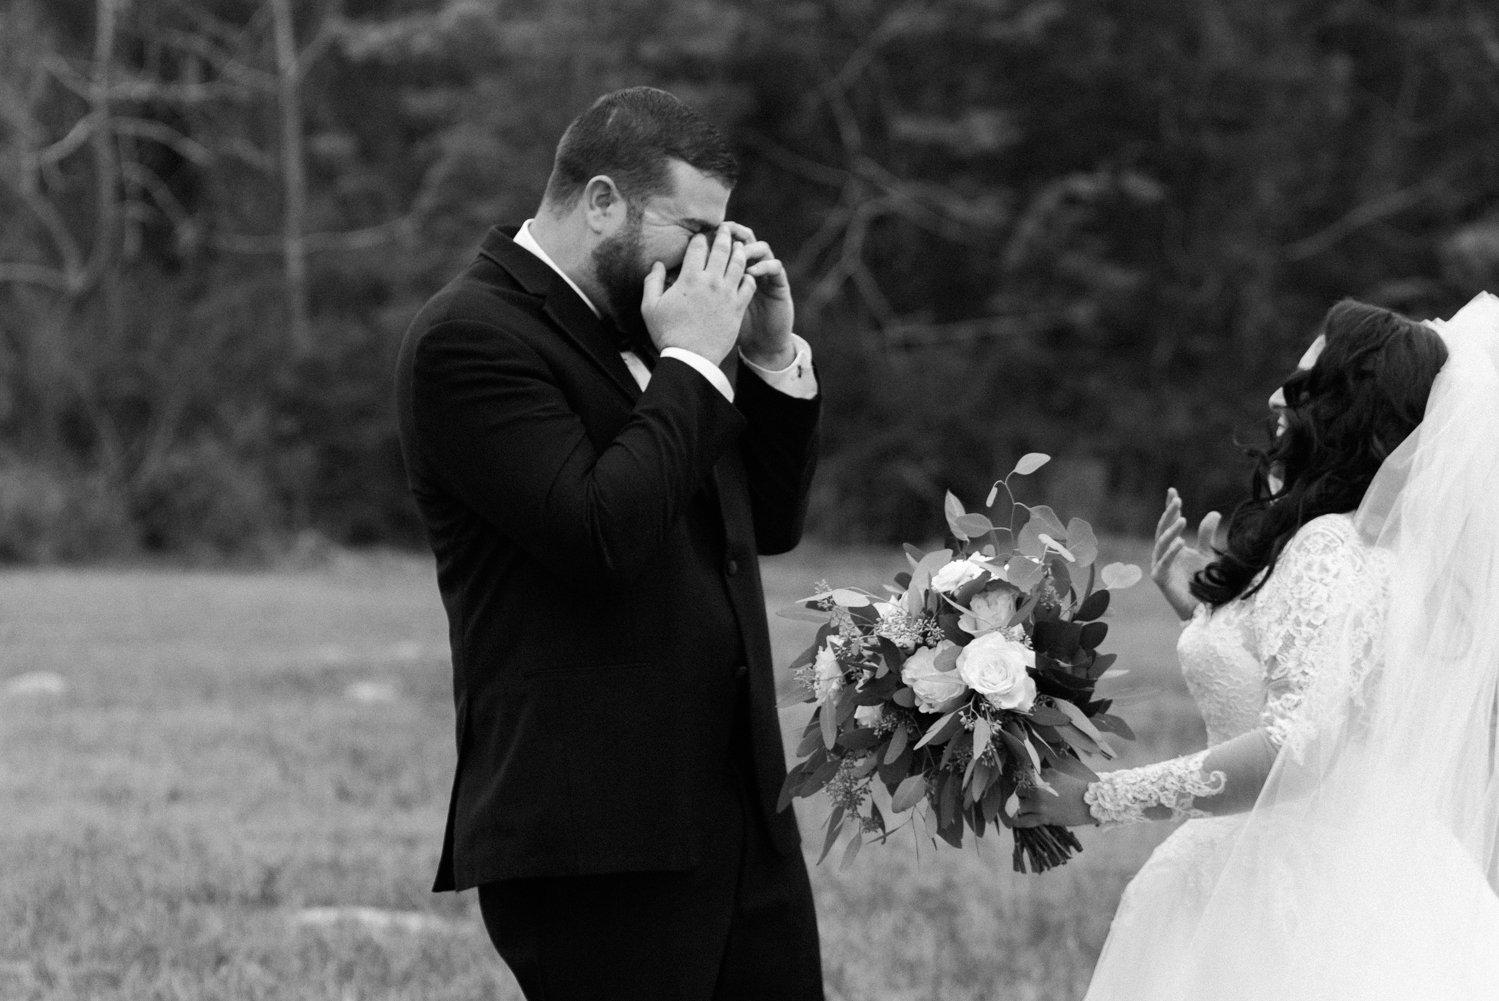 armature-works-wedding-tampa-anna-jim-I58A9424.jpg